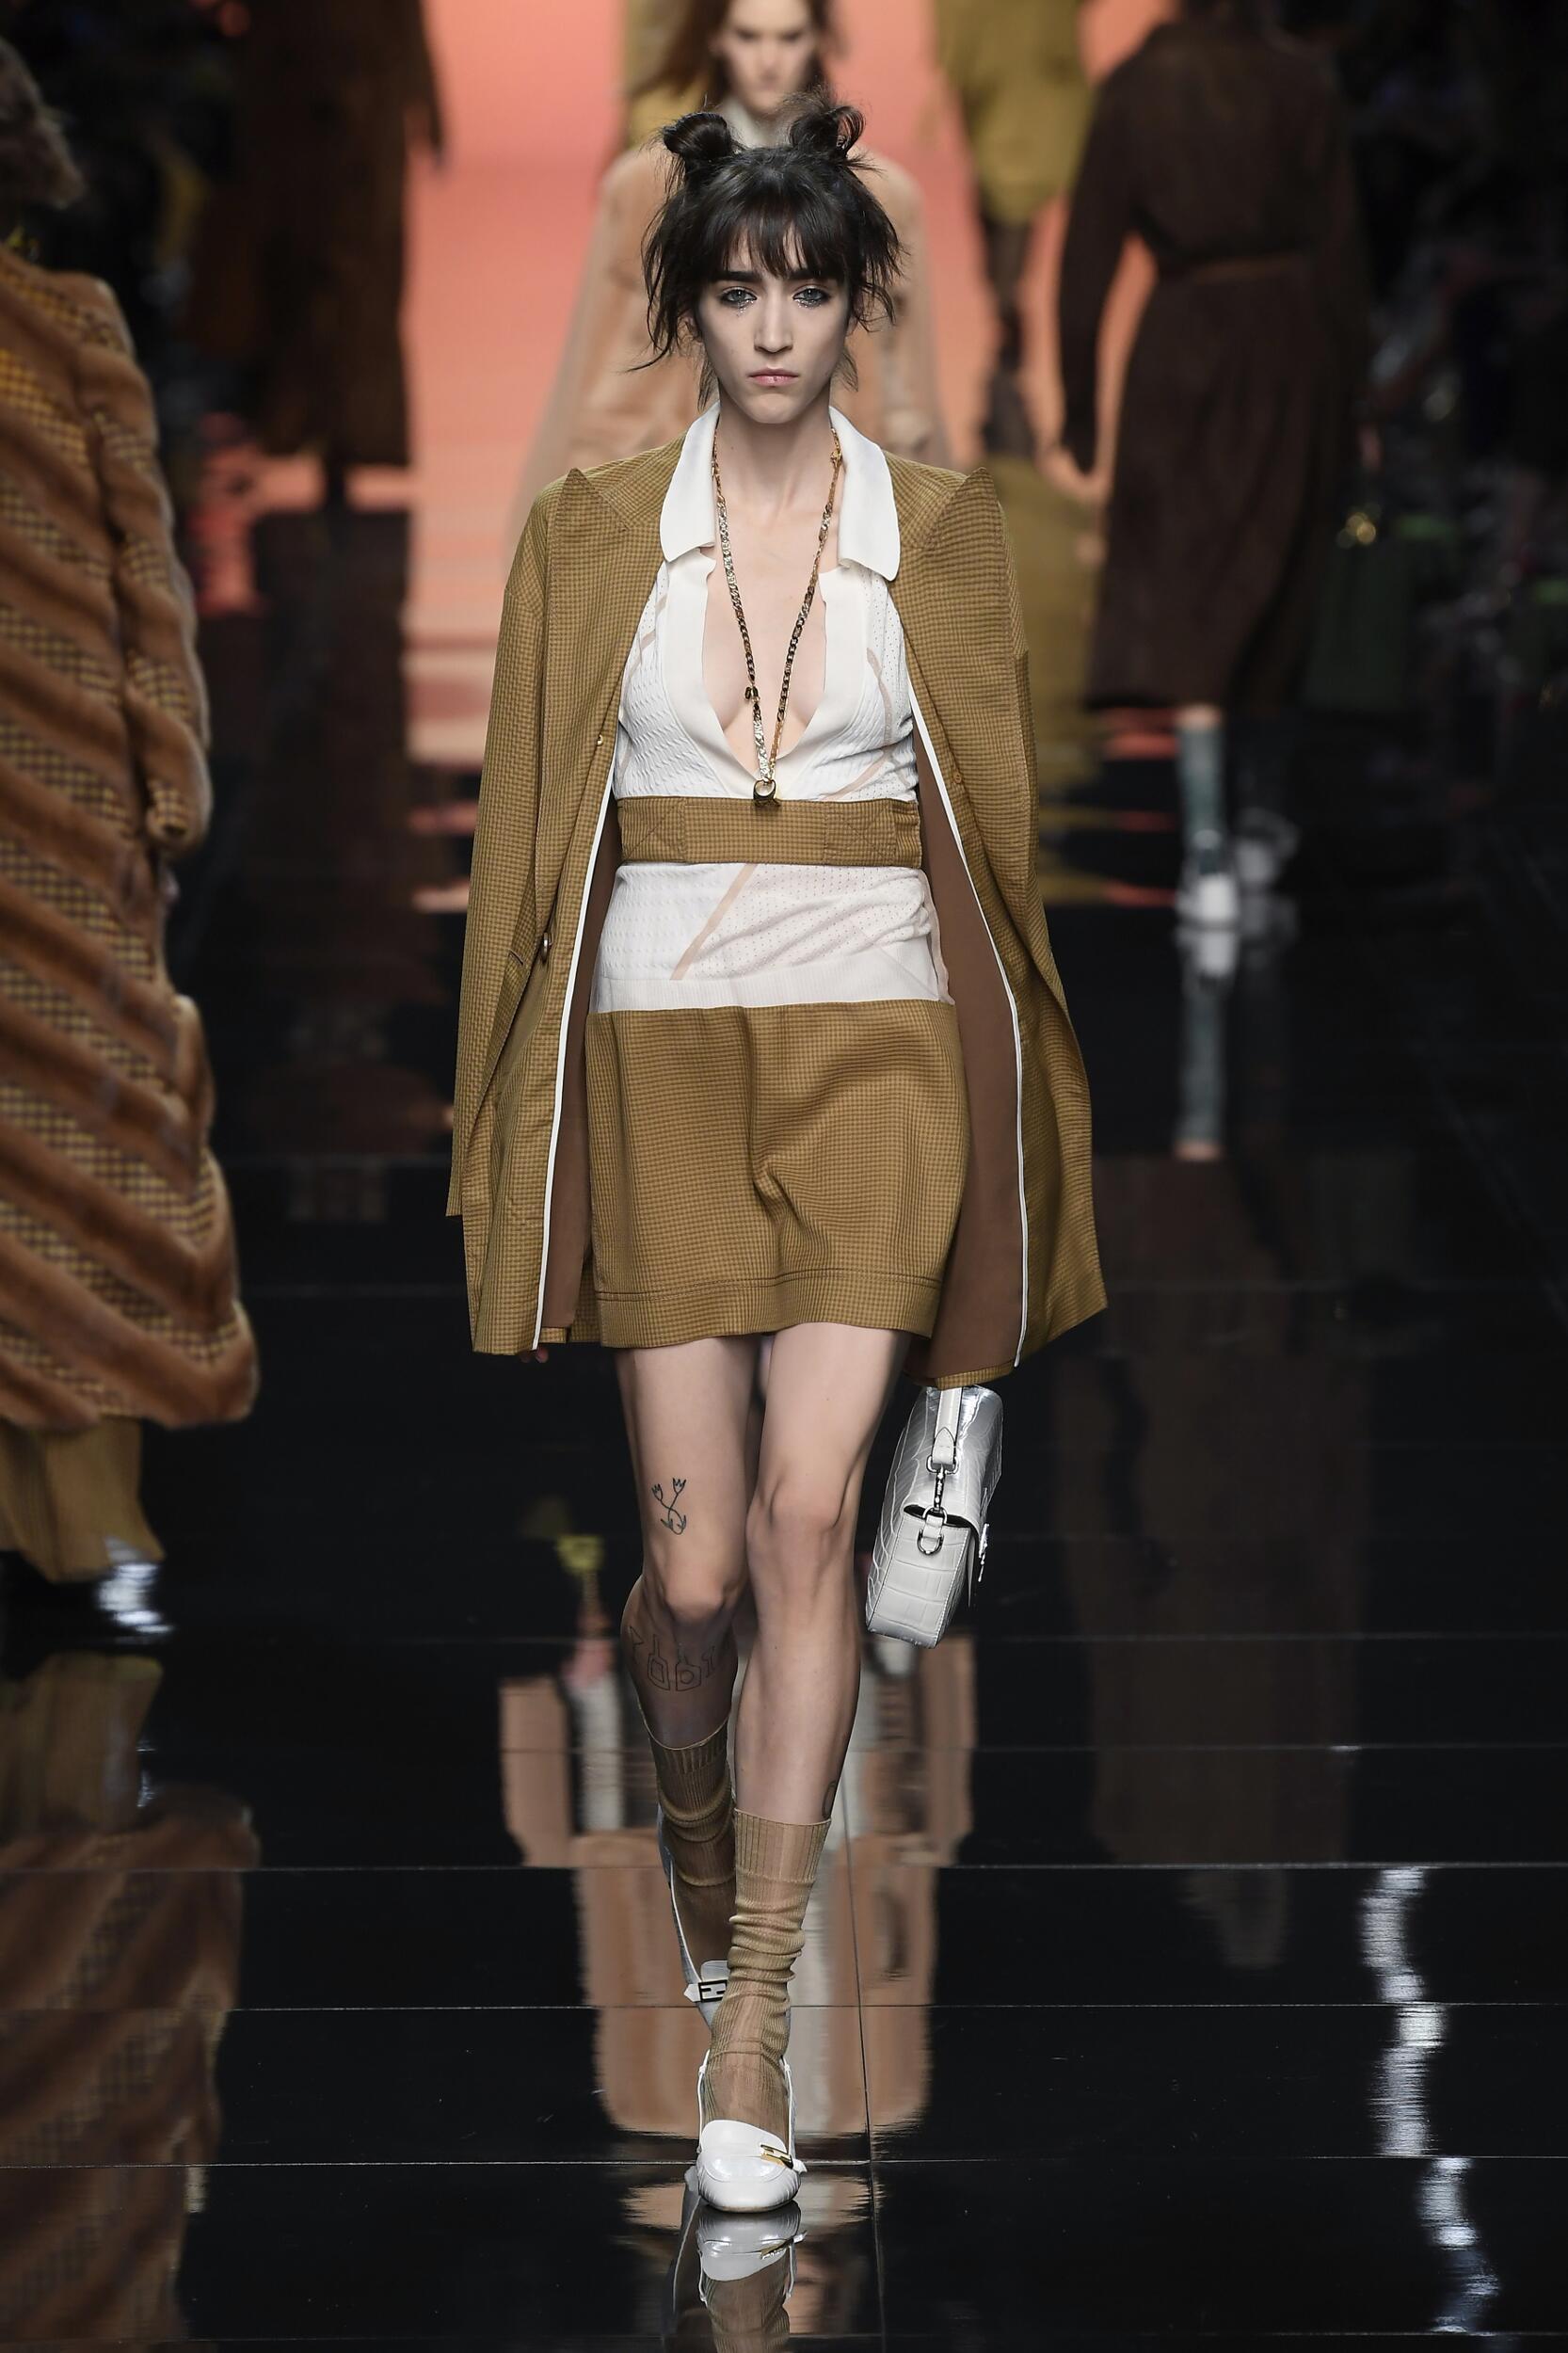 Fashion Model Woman Fendi Catwalk